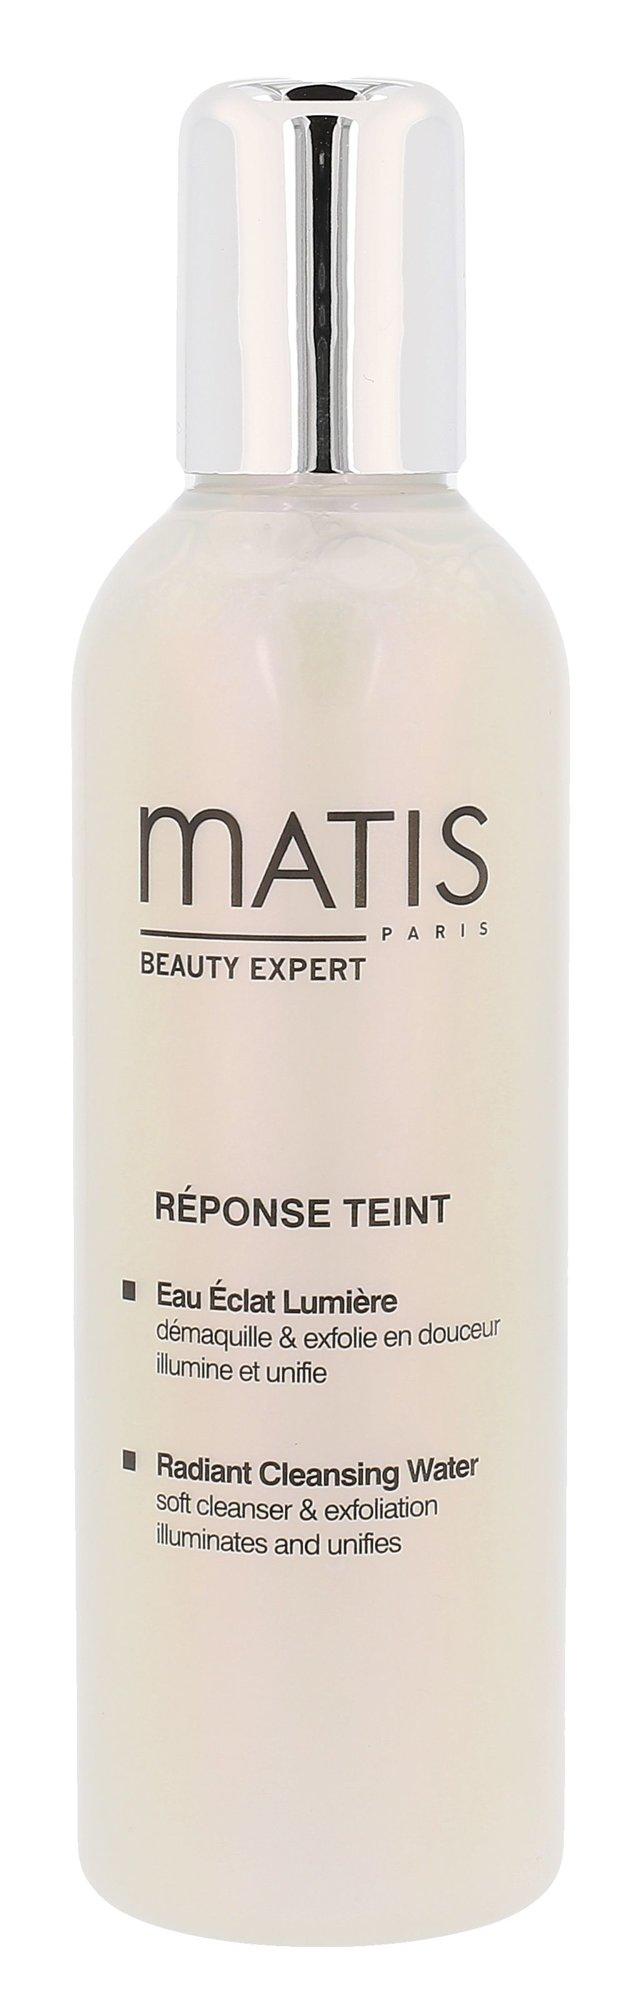 Matis Réponse Teint Cosmetic 200ml